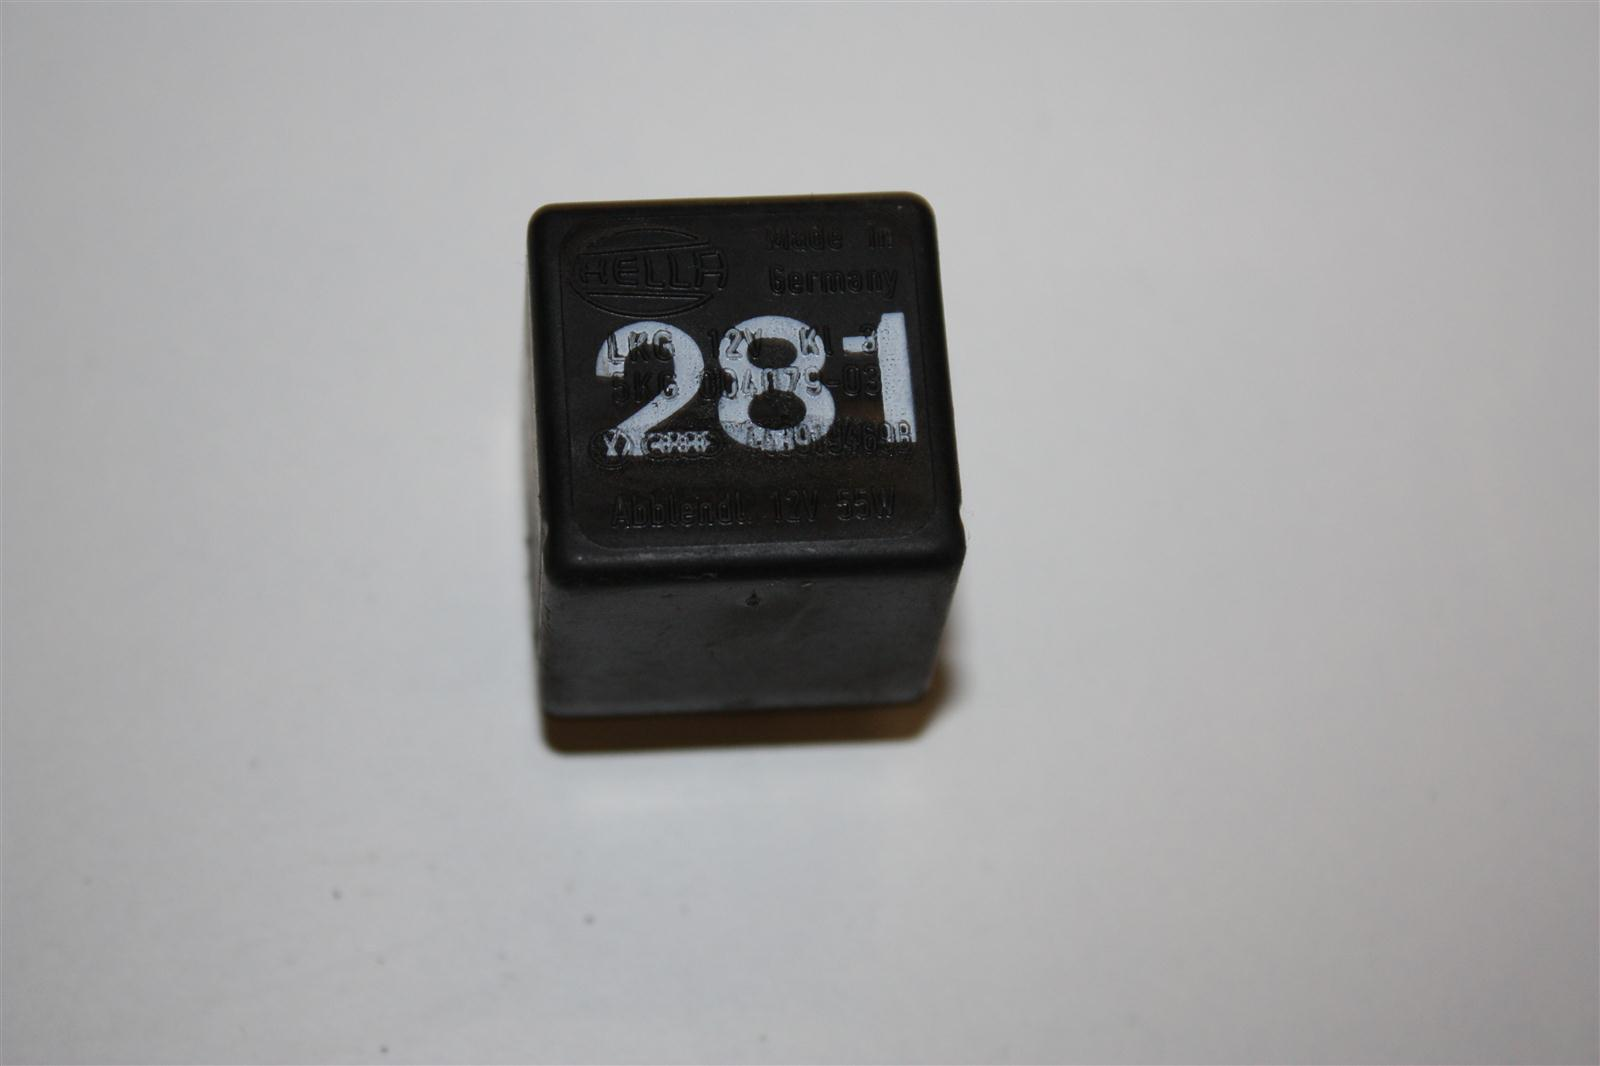 Audi/VW 80/90/100/200 Relais 281 Lampenkomtrollgerät 443919469B